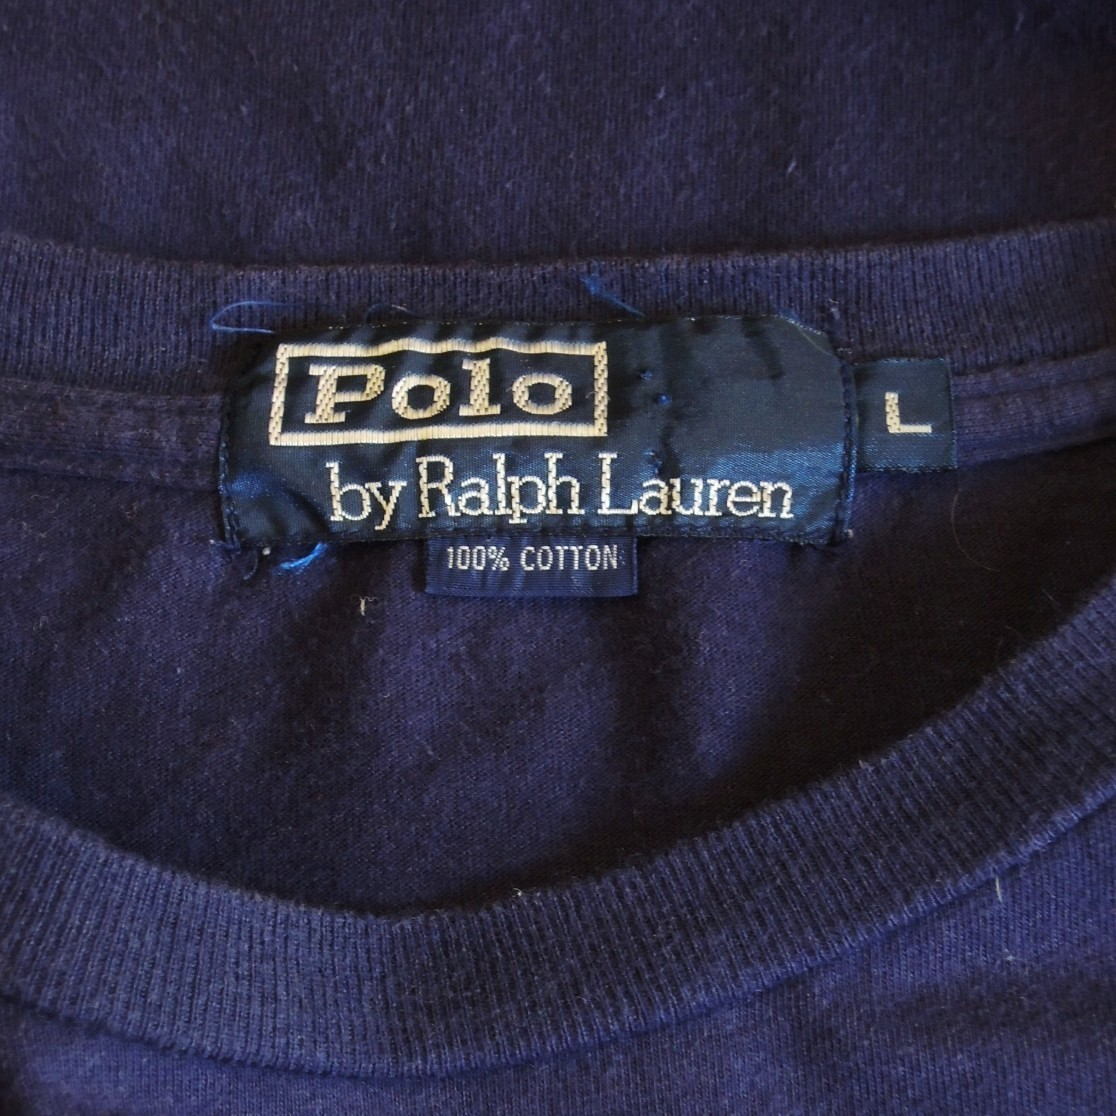 ralphlaurenpockettshirts03.JPG